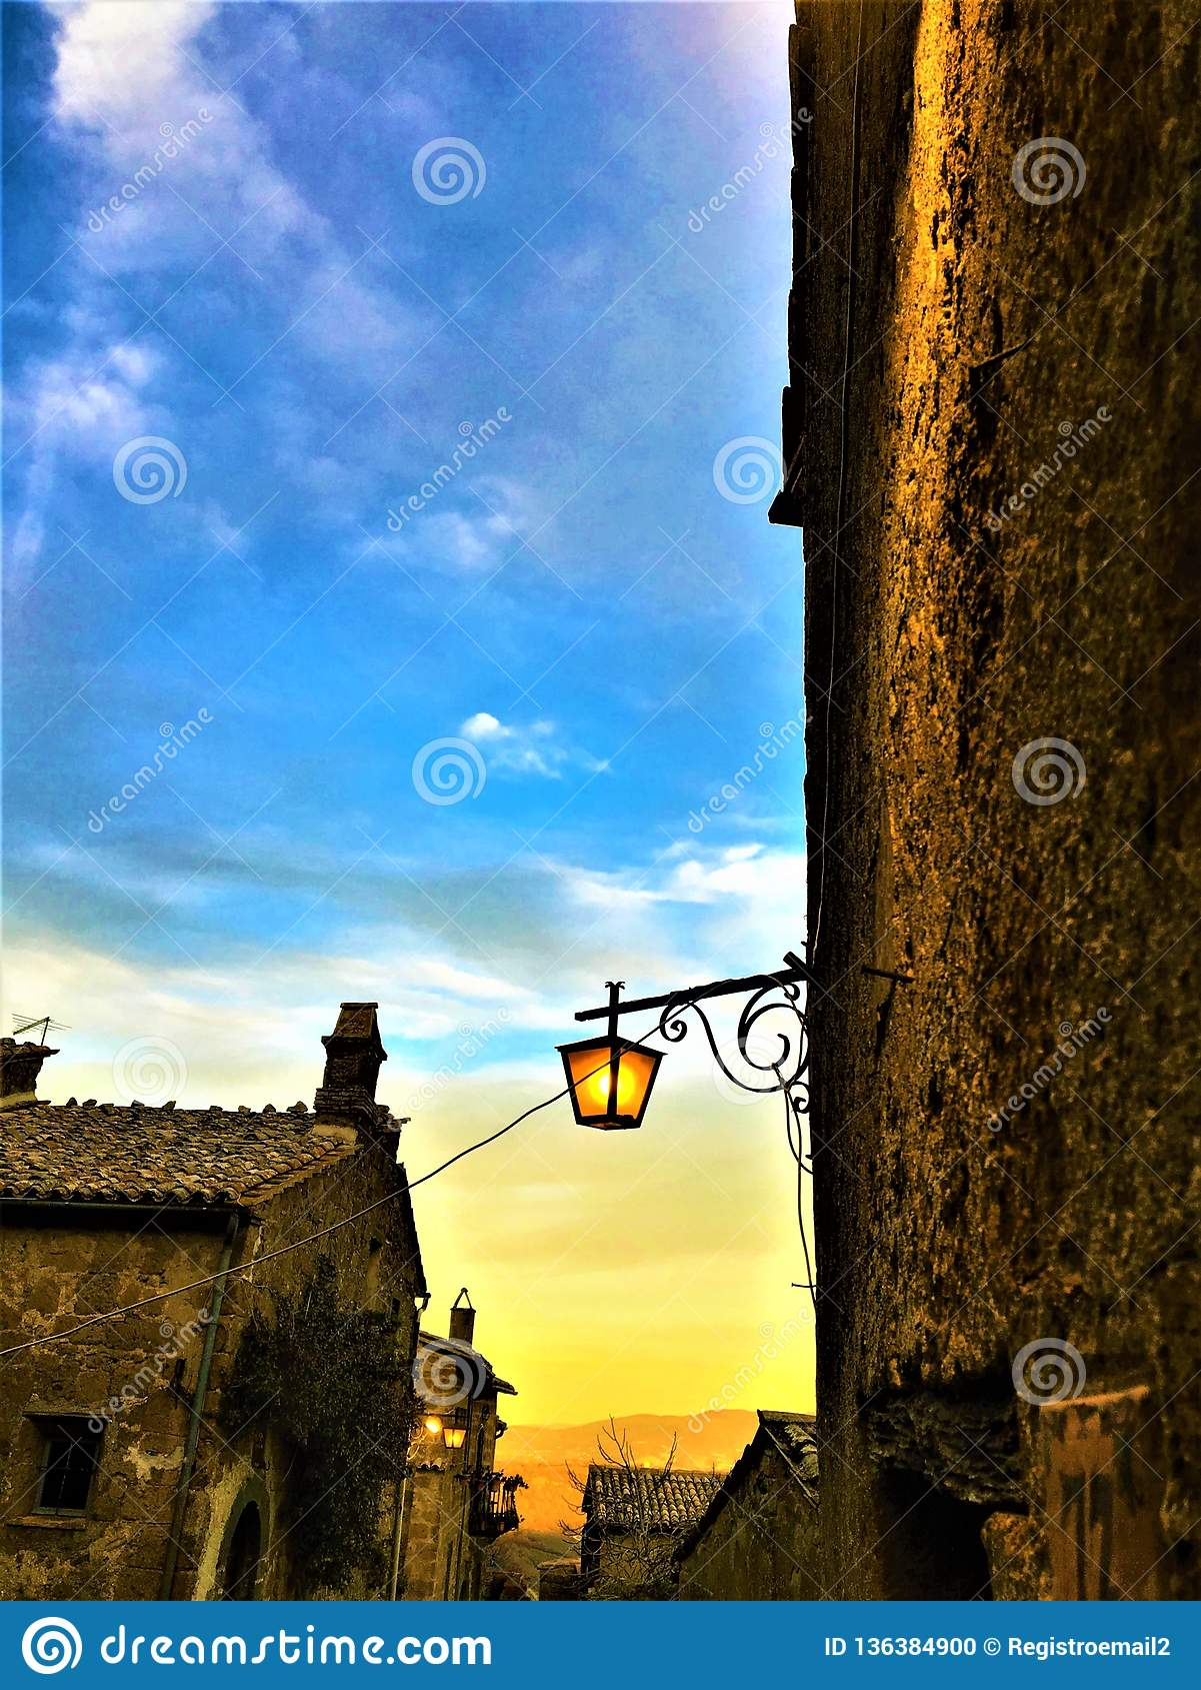 Civita Di Bagnoregio, stad in de provincie van Viterbo, Italië Zonsondergang, geschiedenis, architectuur, lamp, verlichting, heme